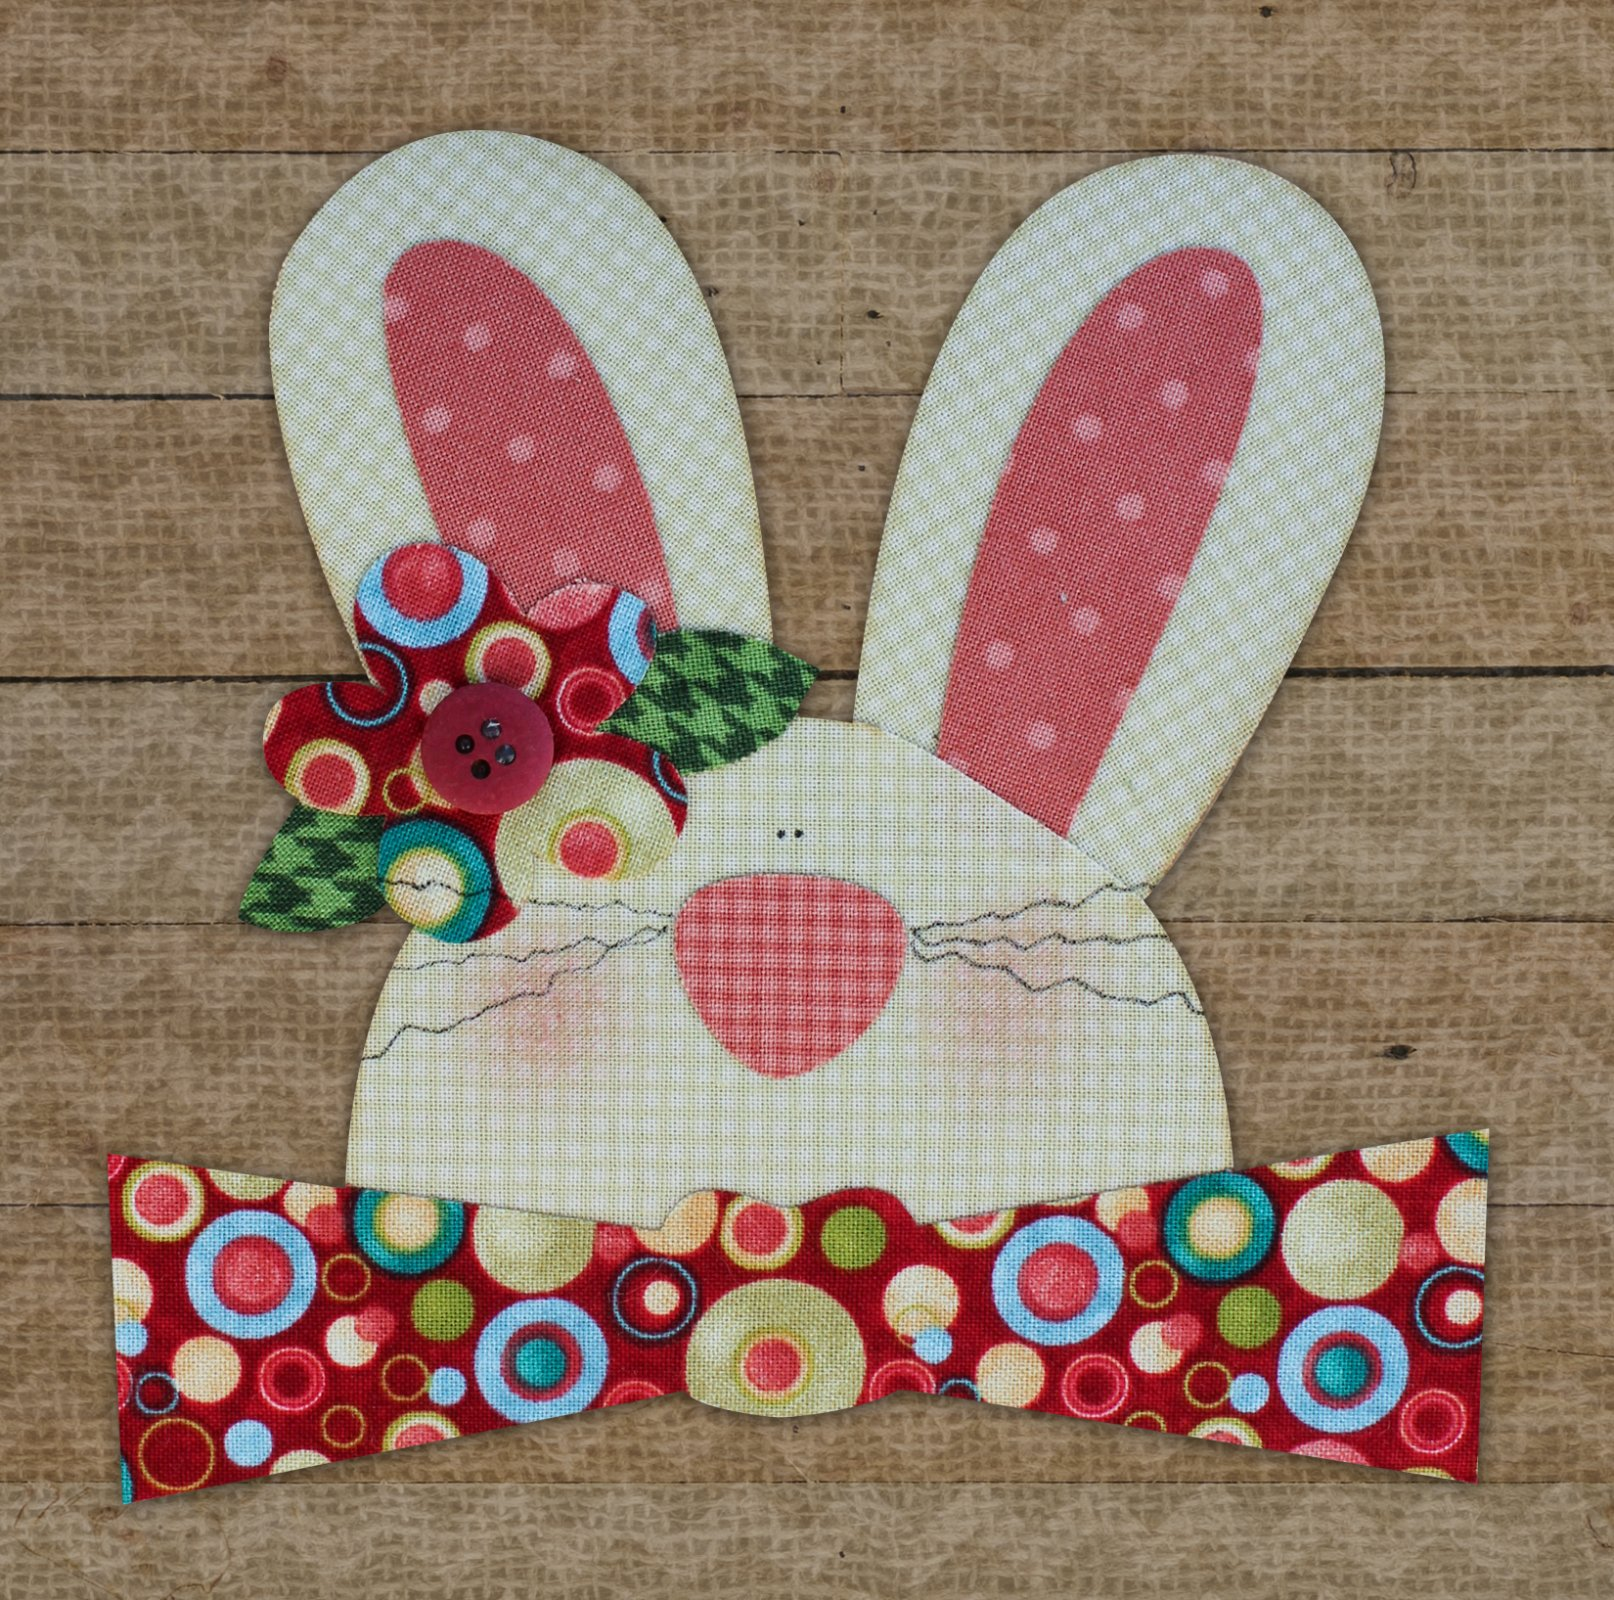 Bunny Precut Fused Applique Kit